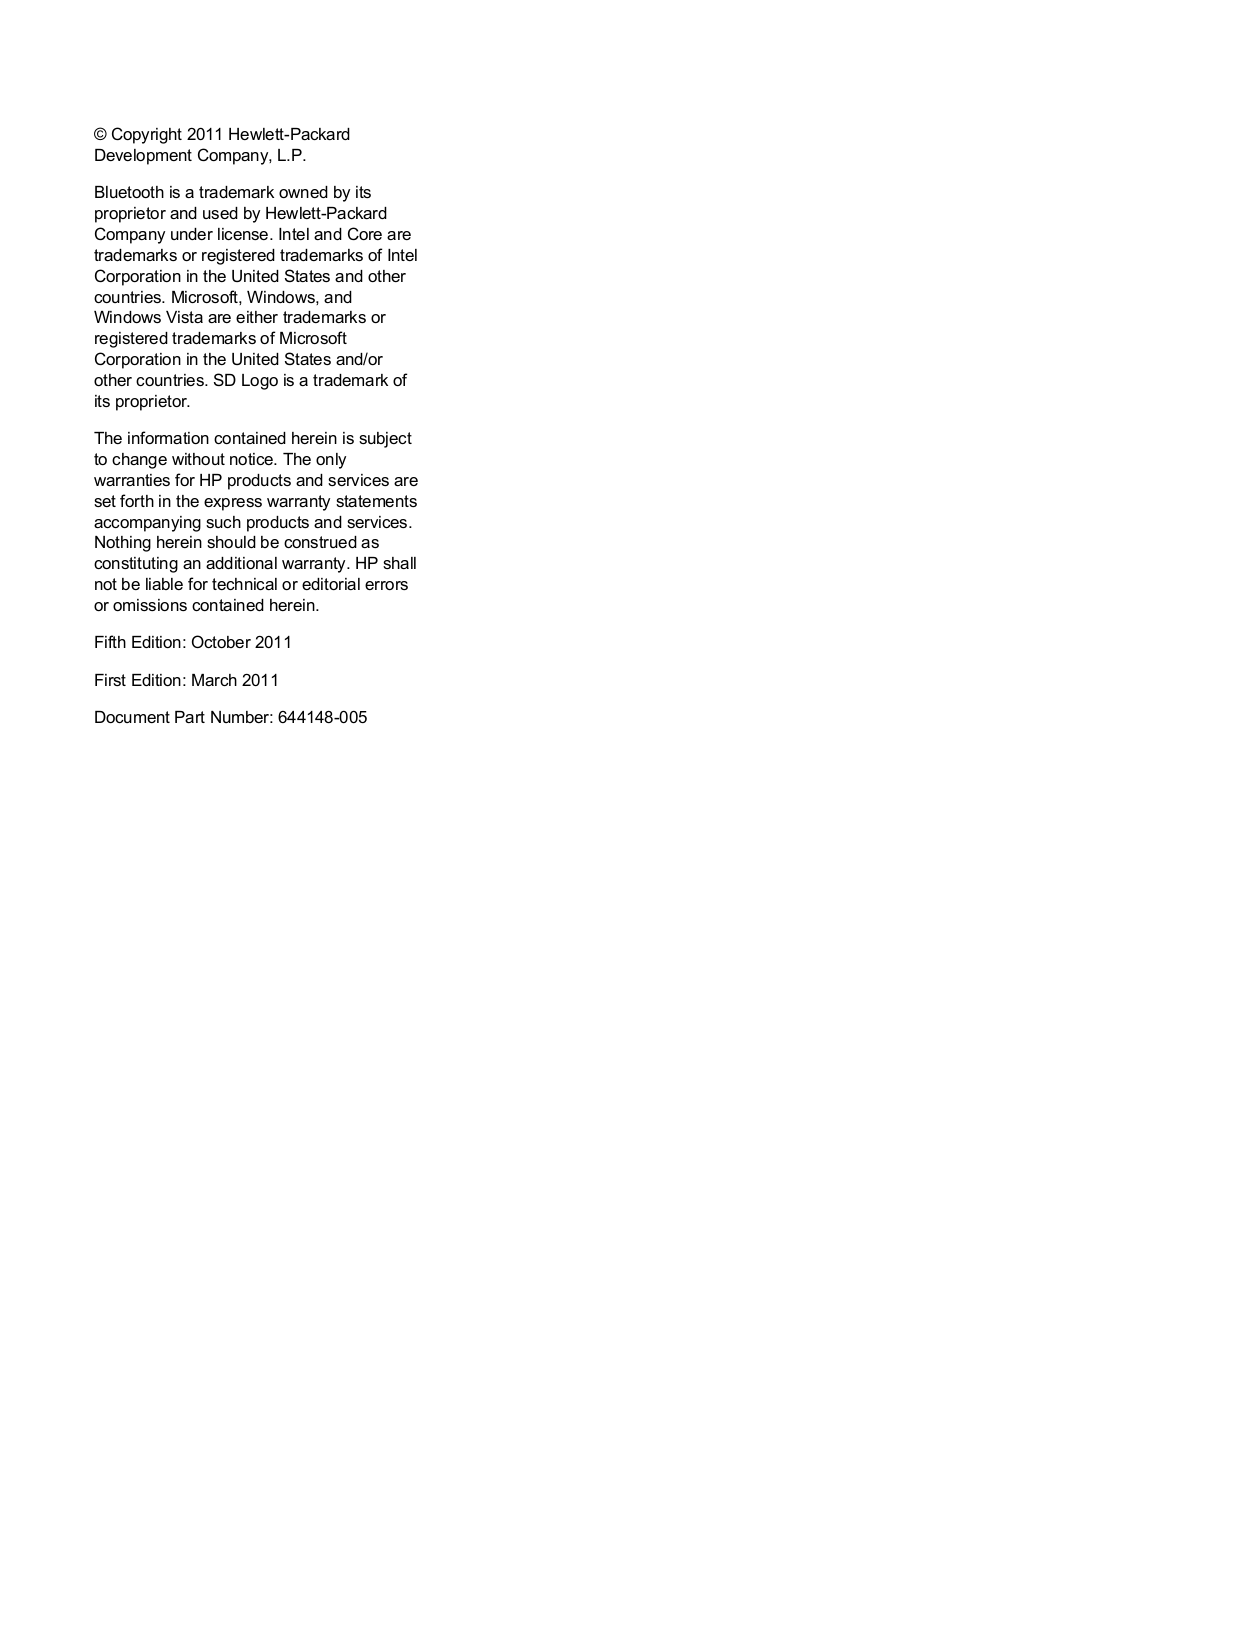 hp probook 6460b manual pdf